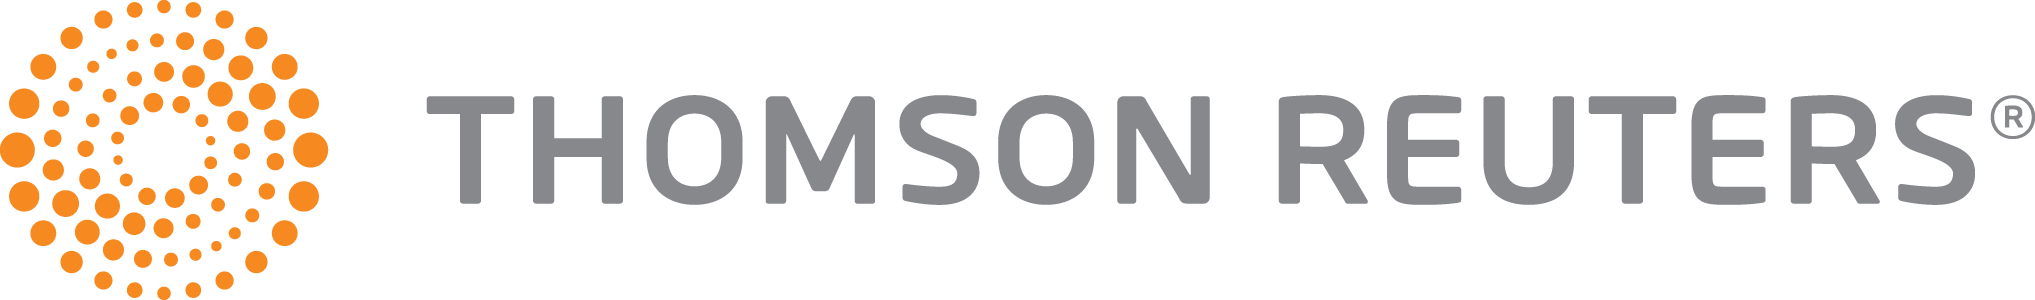 thomson_reuter_logo